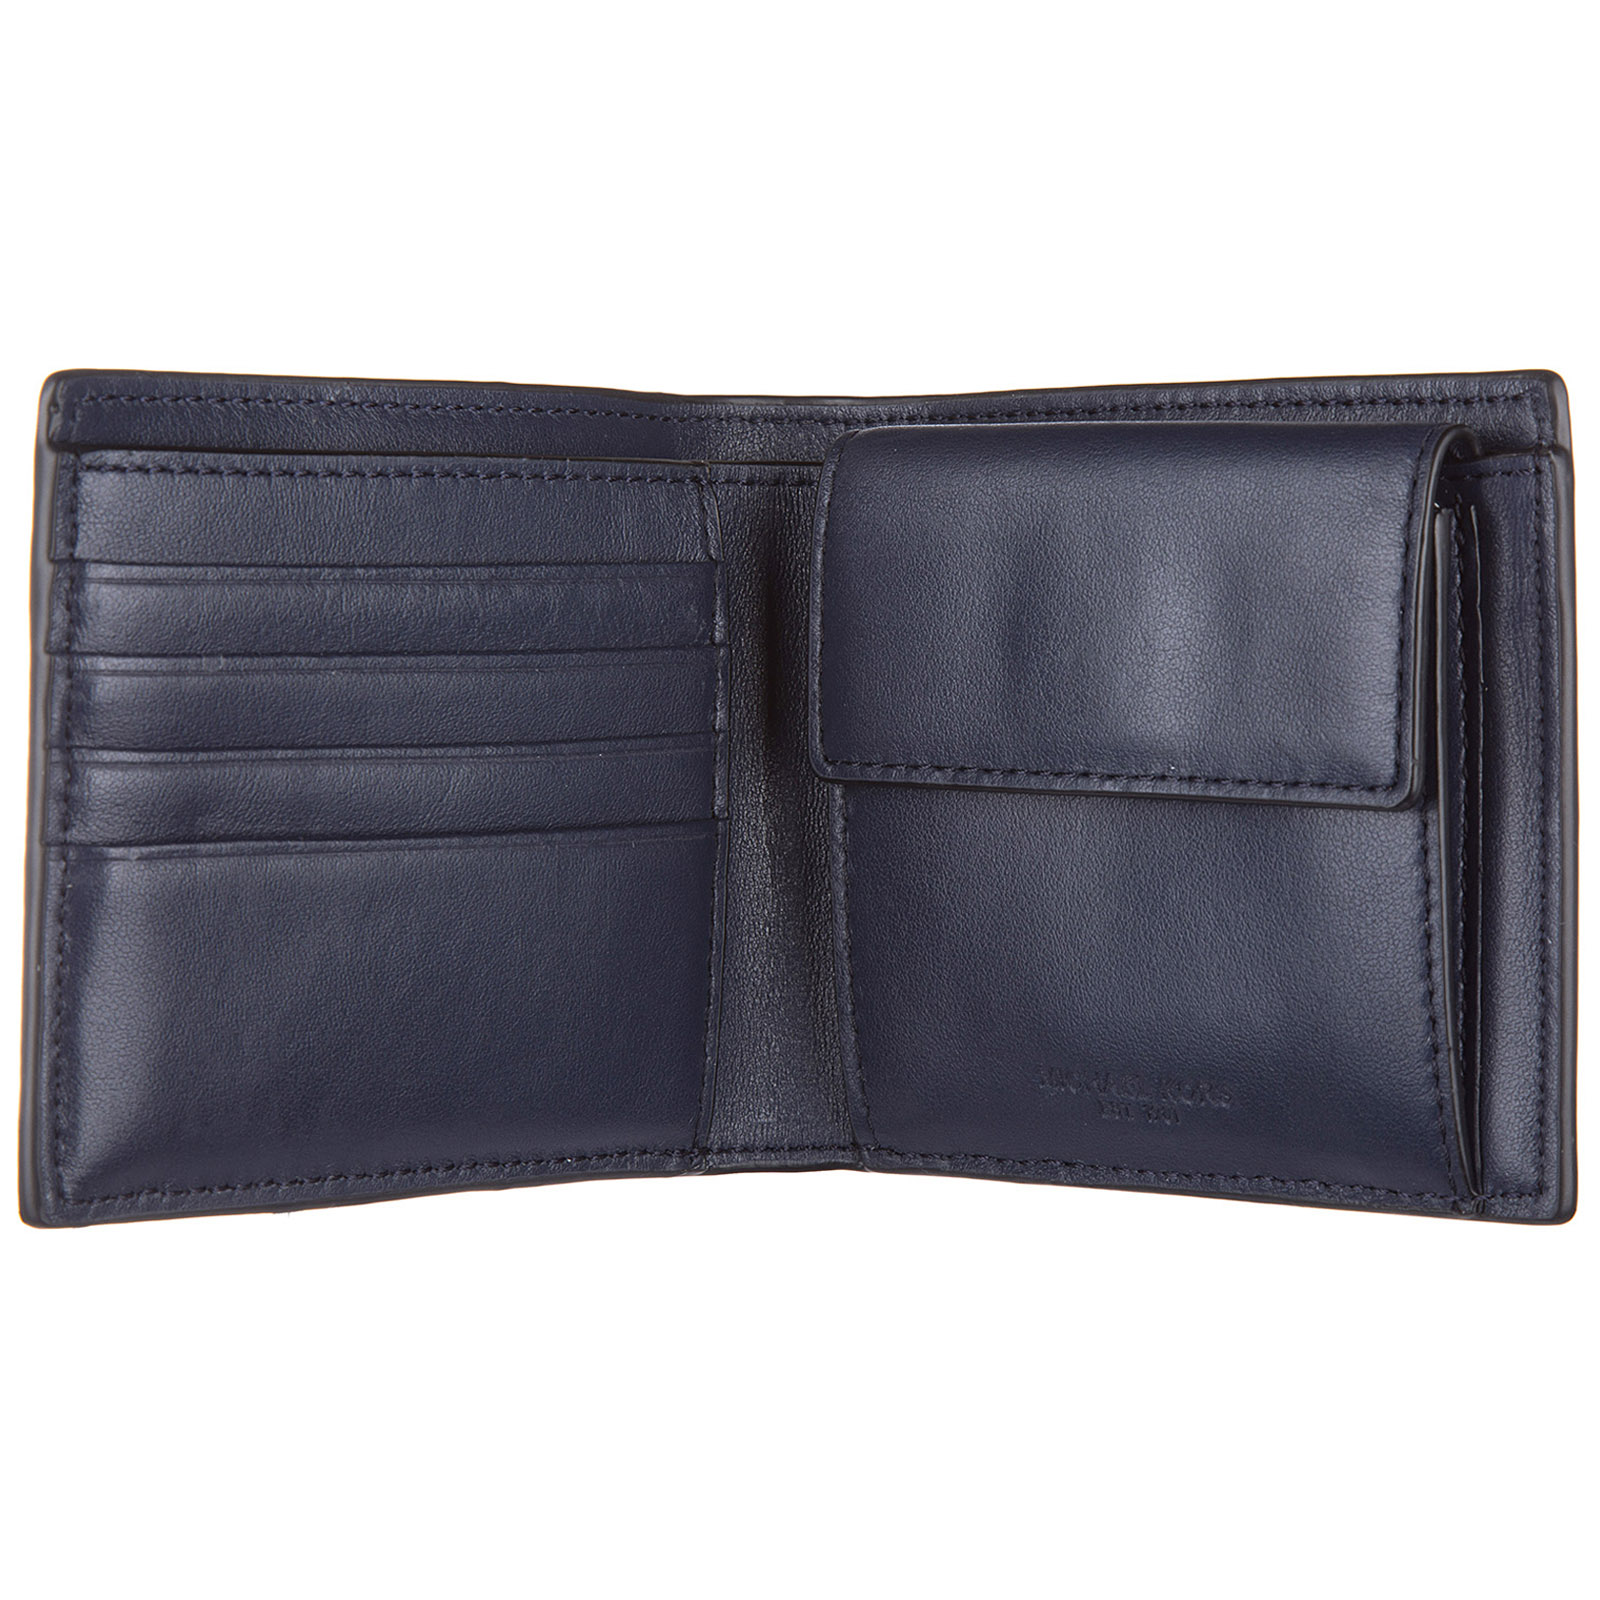 4dae43dd26a3 ... Men's wallet genuine leather coin case holder purse card bifold harrison  ...